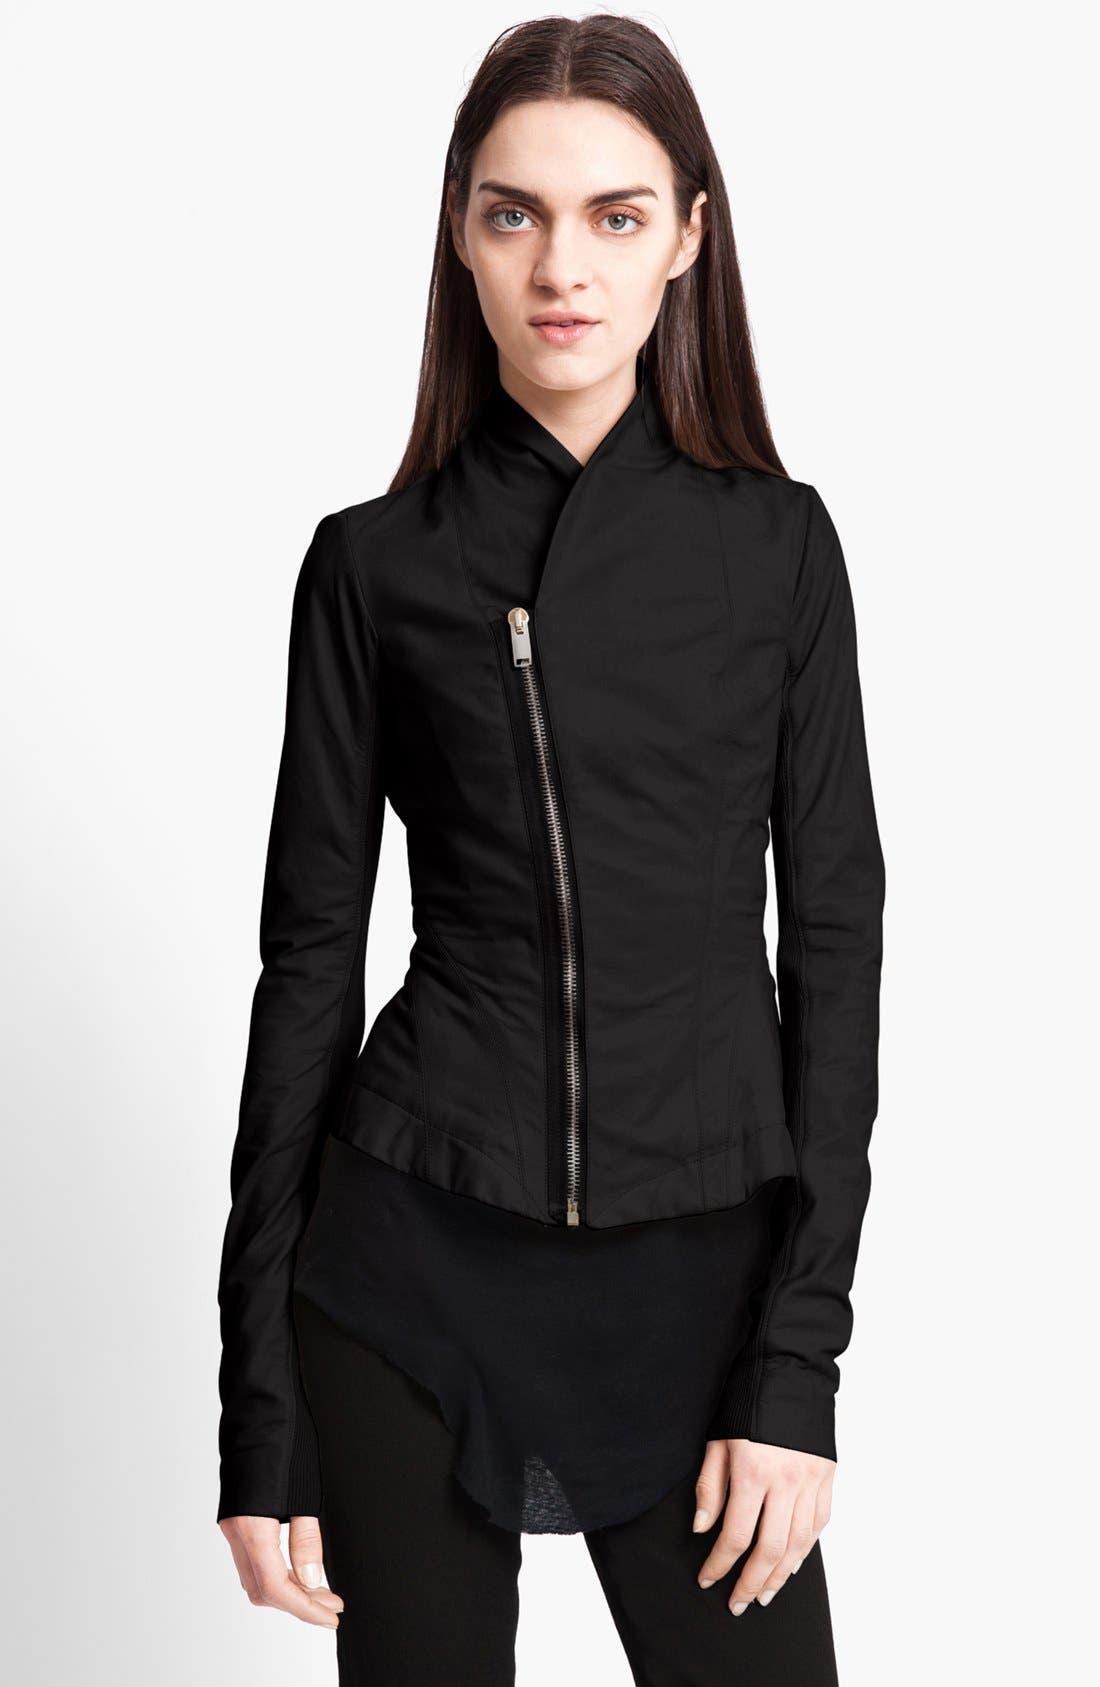 Main Image - Rick Owens Calfskin Leather Jacket